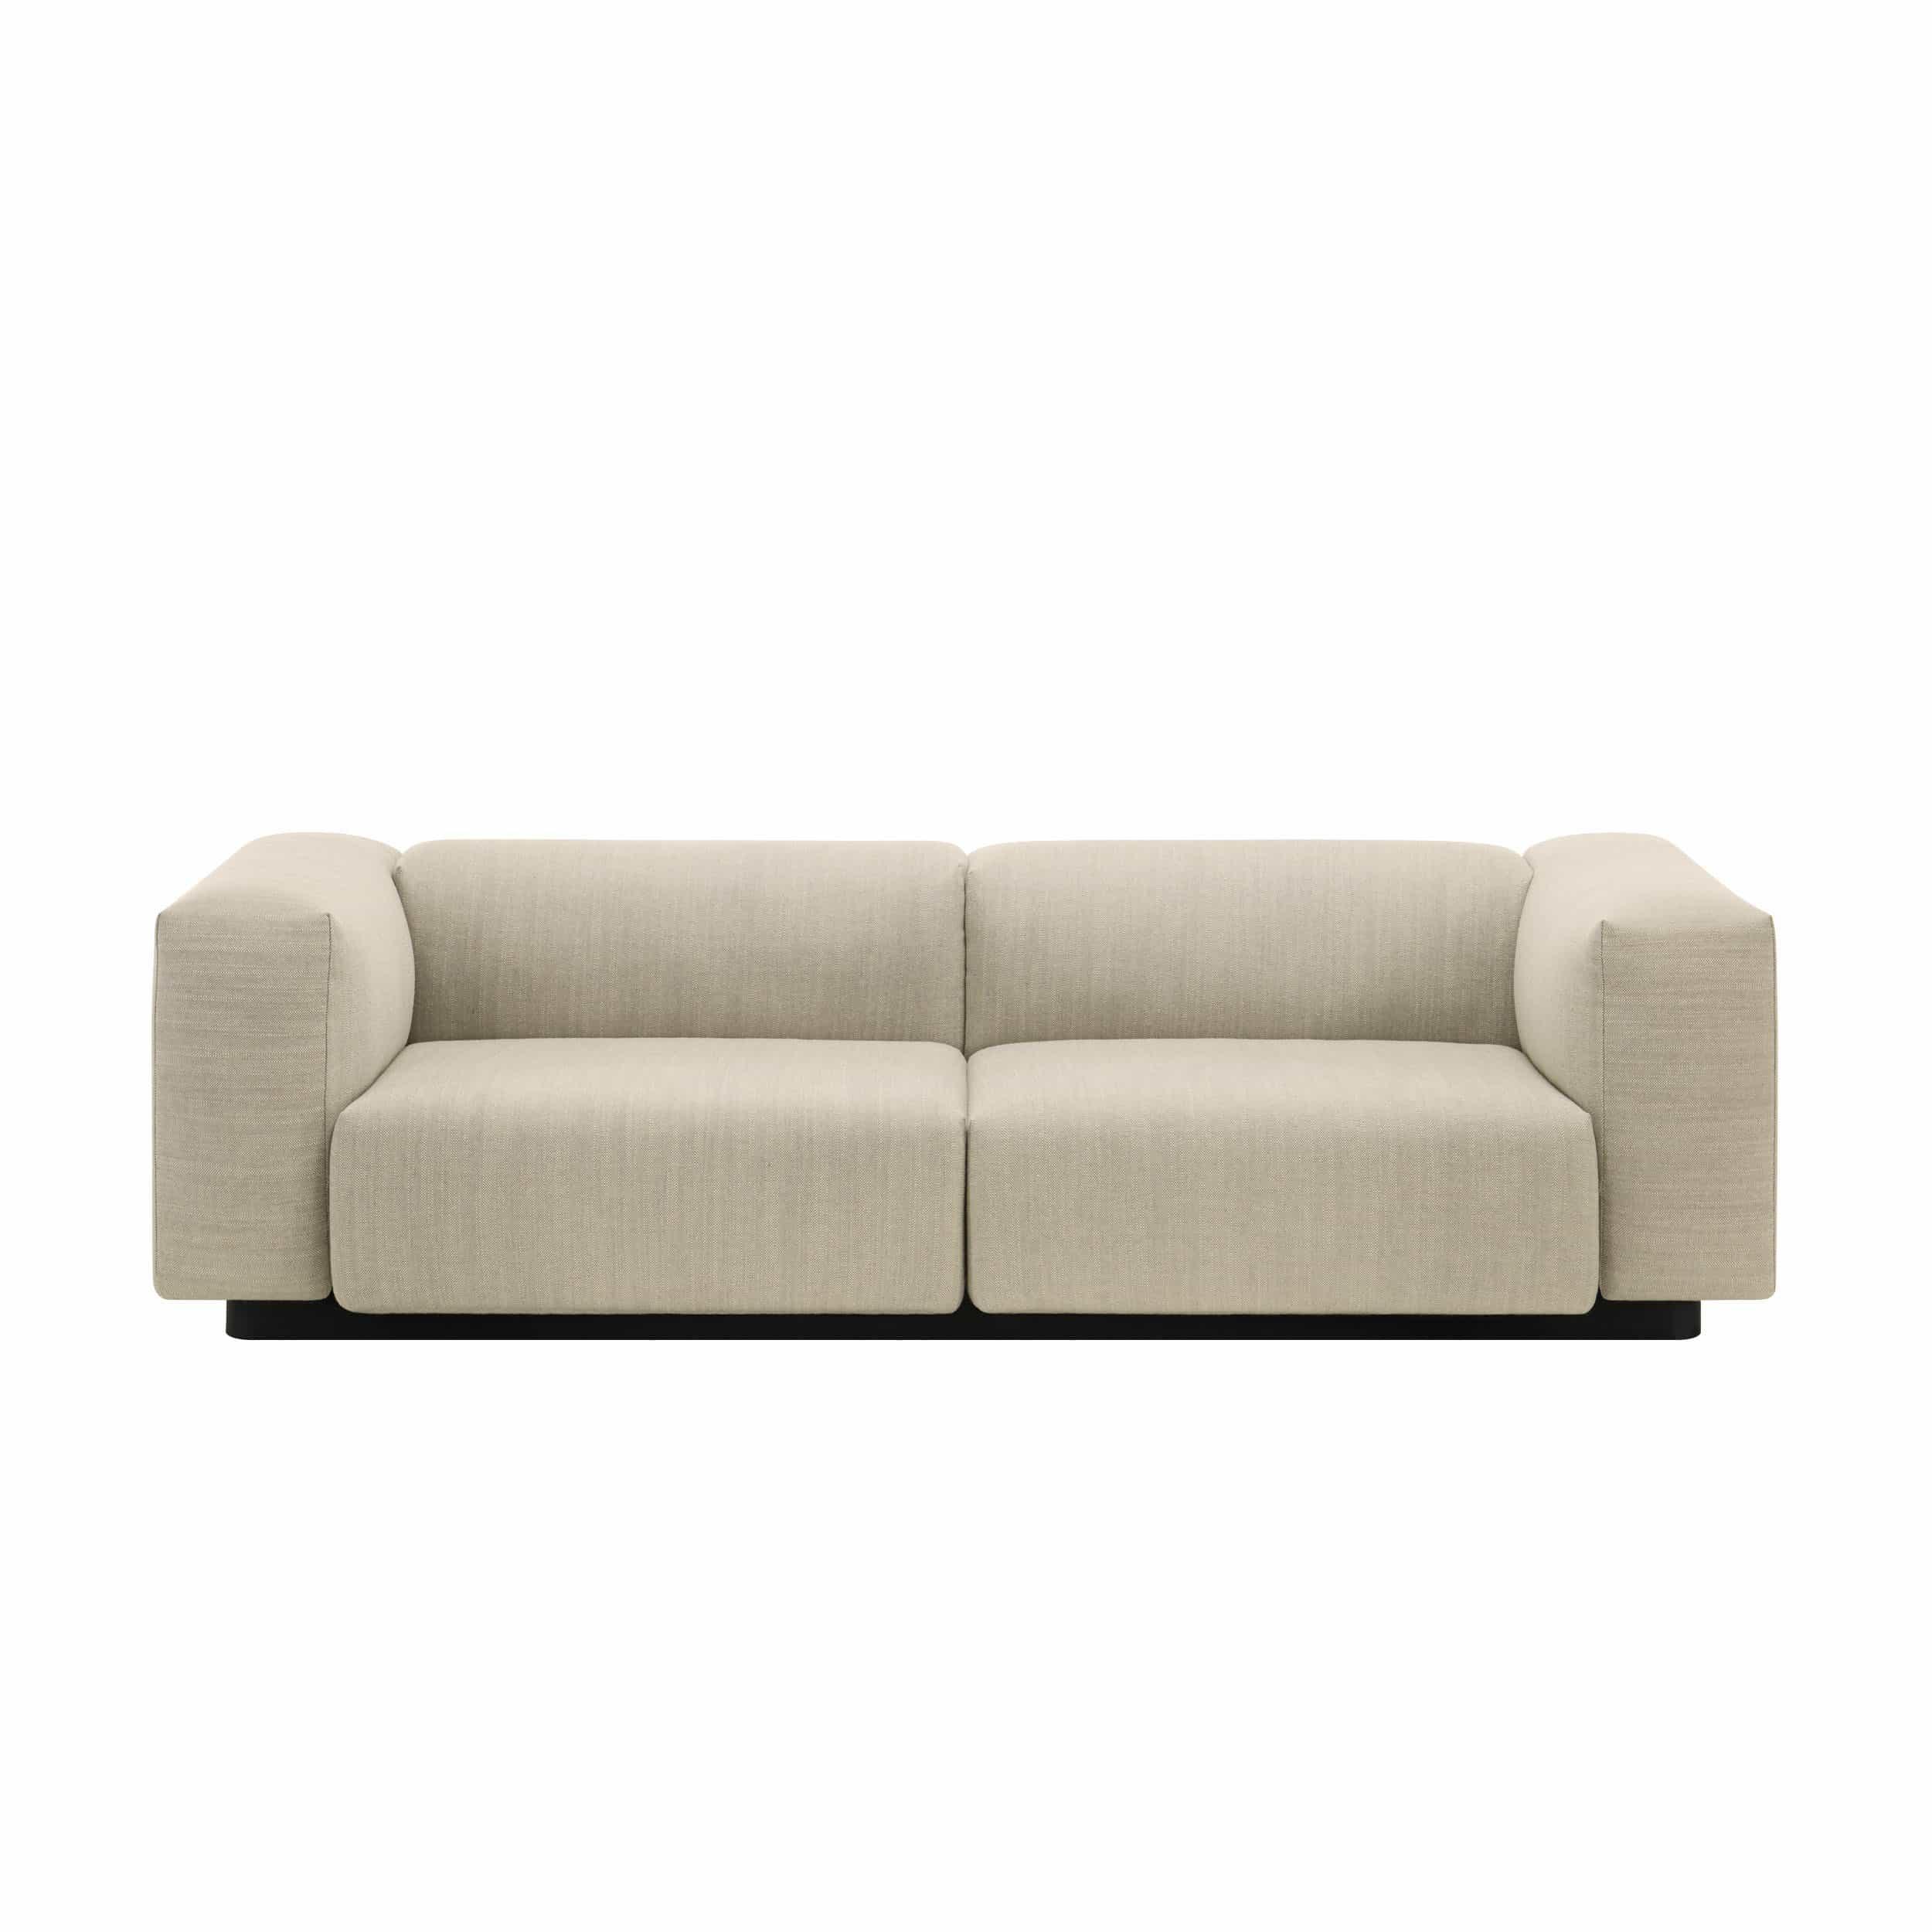 Soft Modular 2-Sitzer Sofa